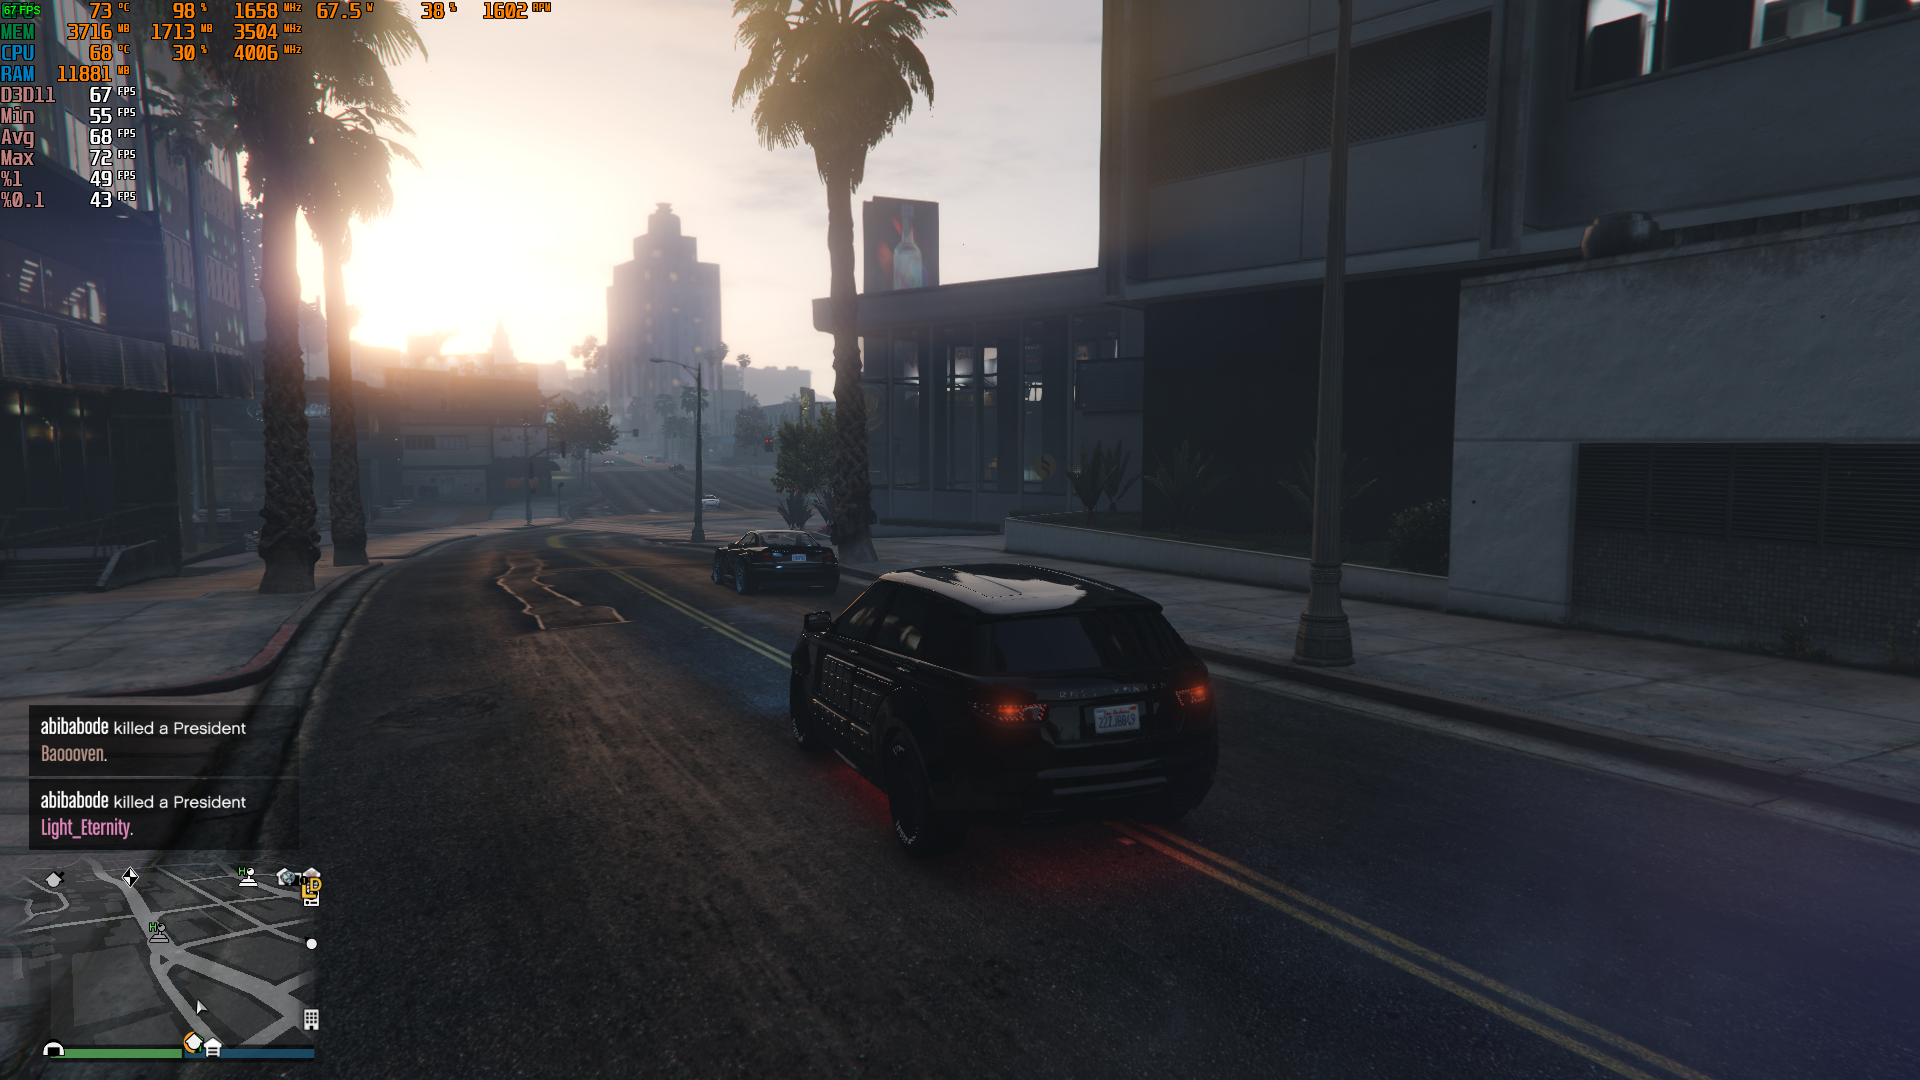 Grand Theft Auto V Screenshot 2021.05.06 - 14.24.21.22.png